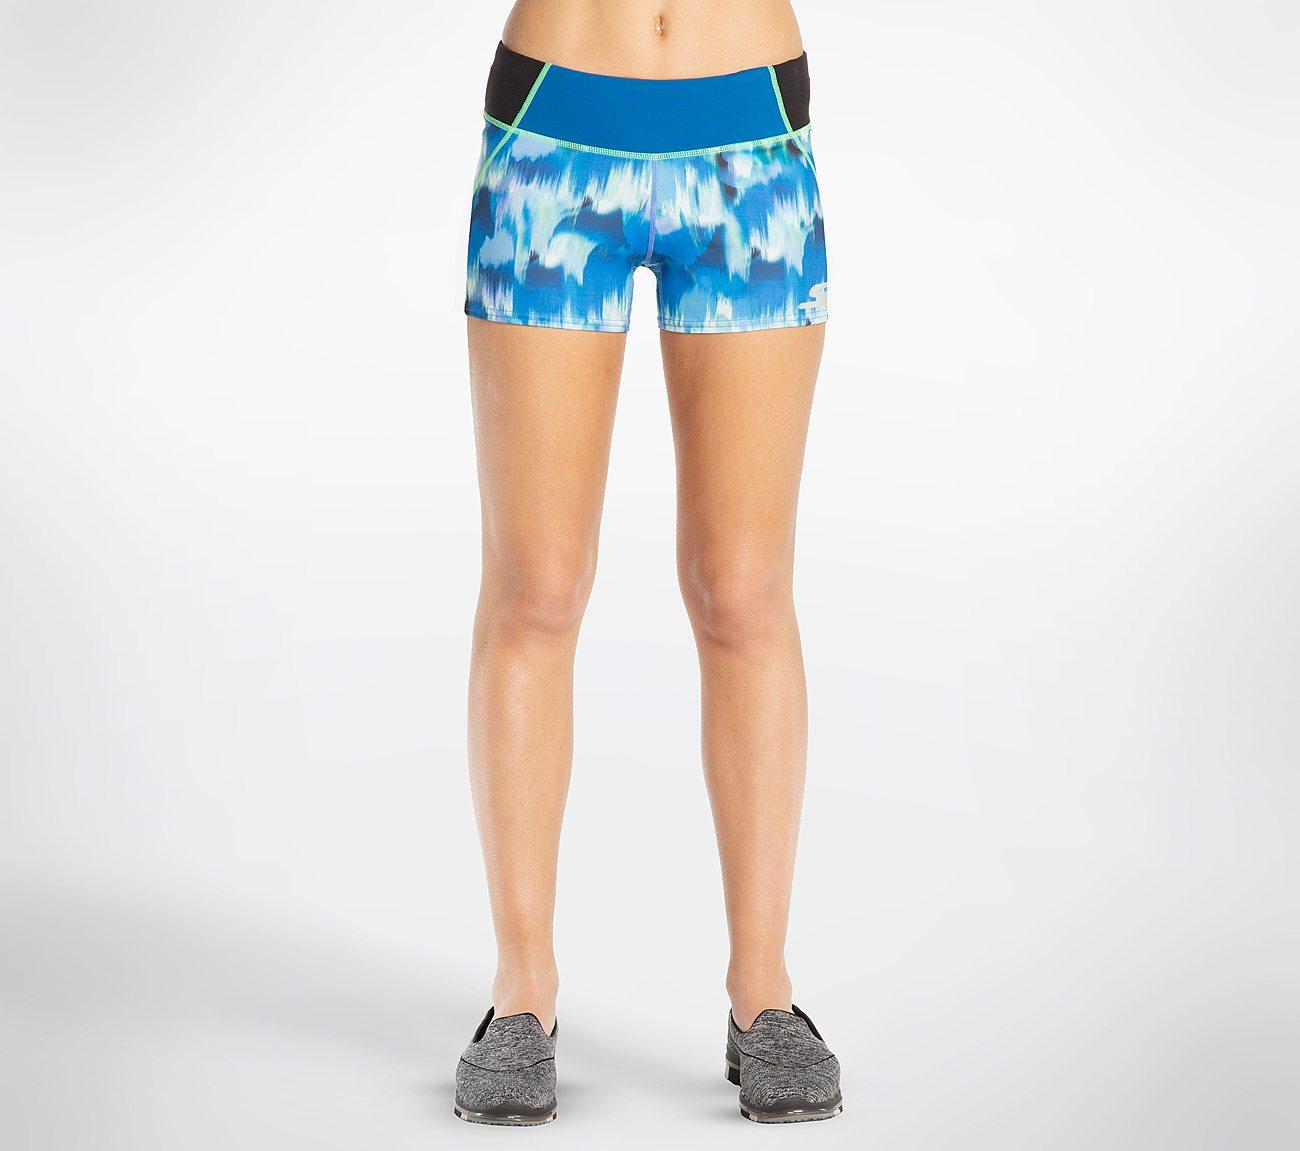 Glow Shorts